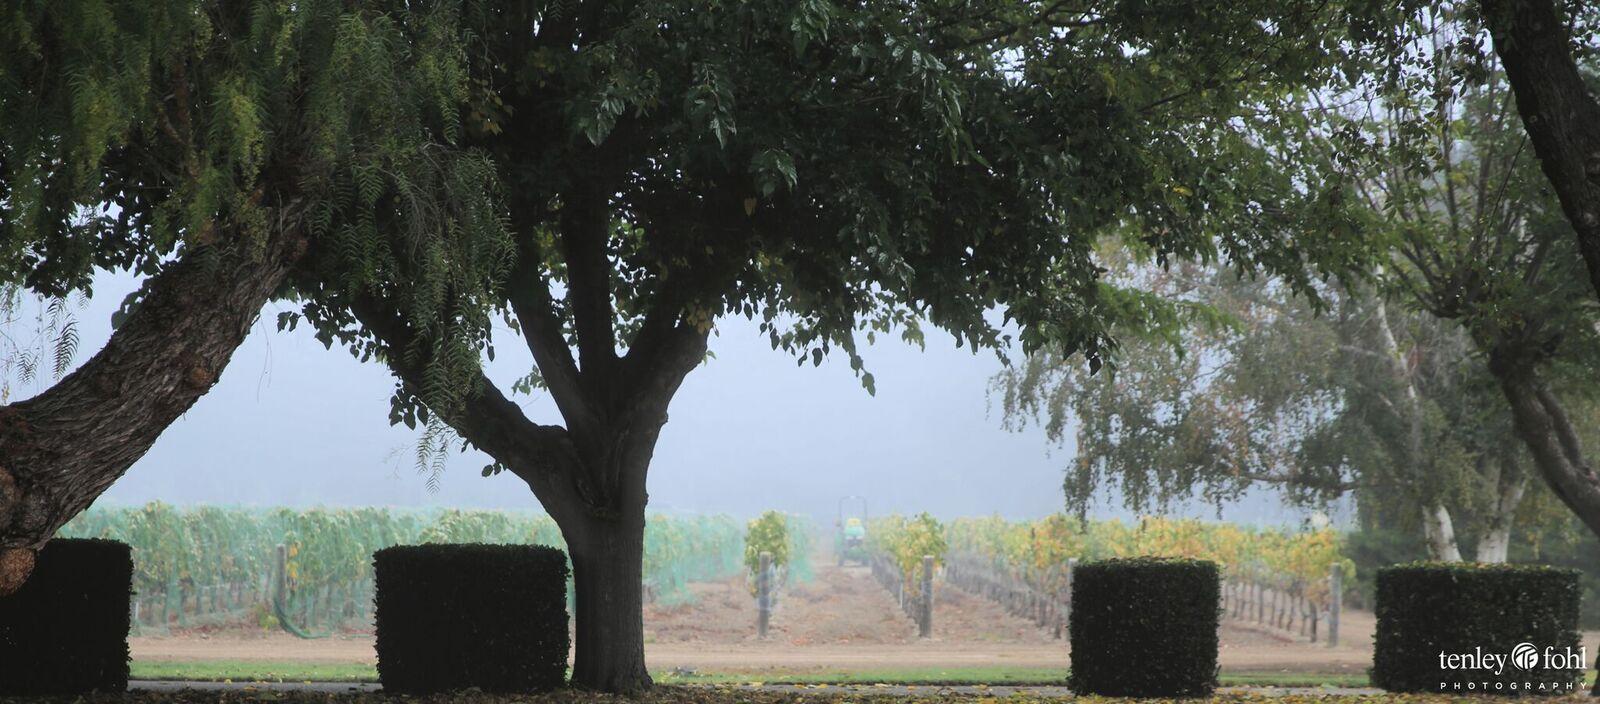 Terrior - unique to the Santa Ynez Valley